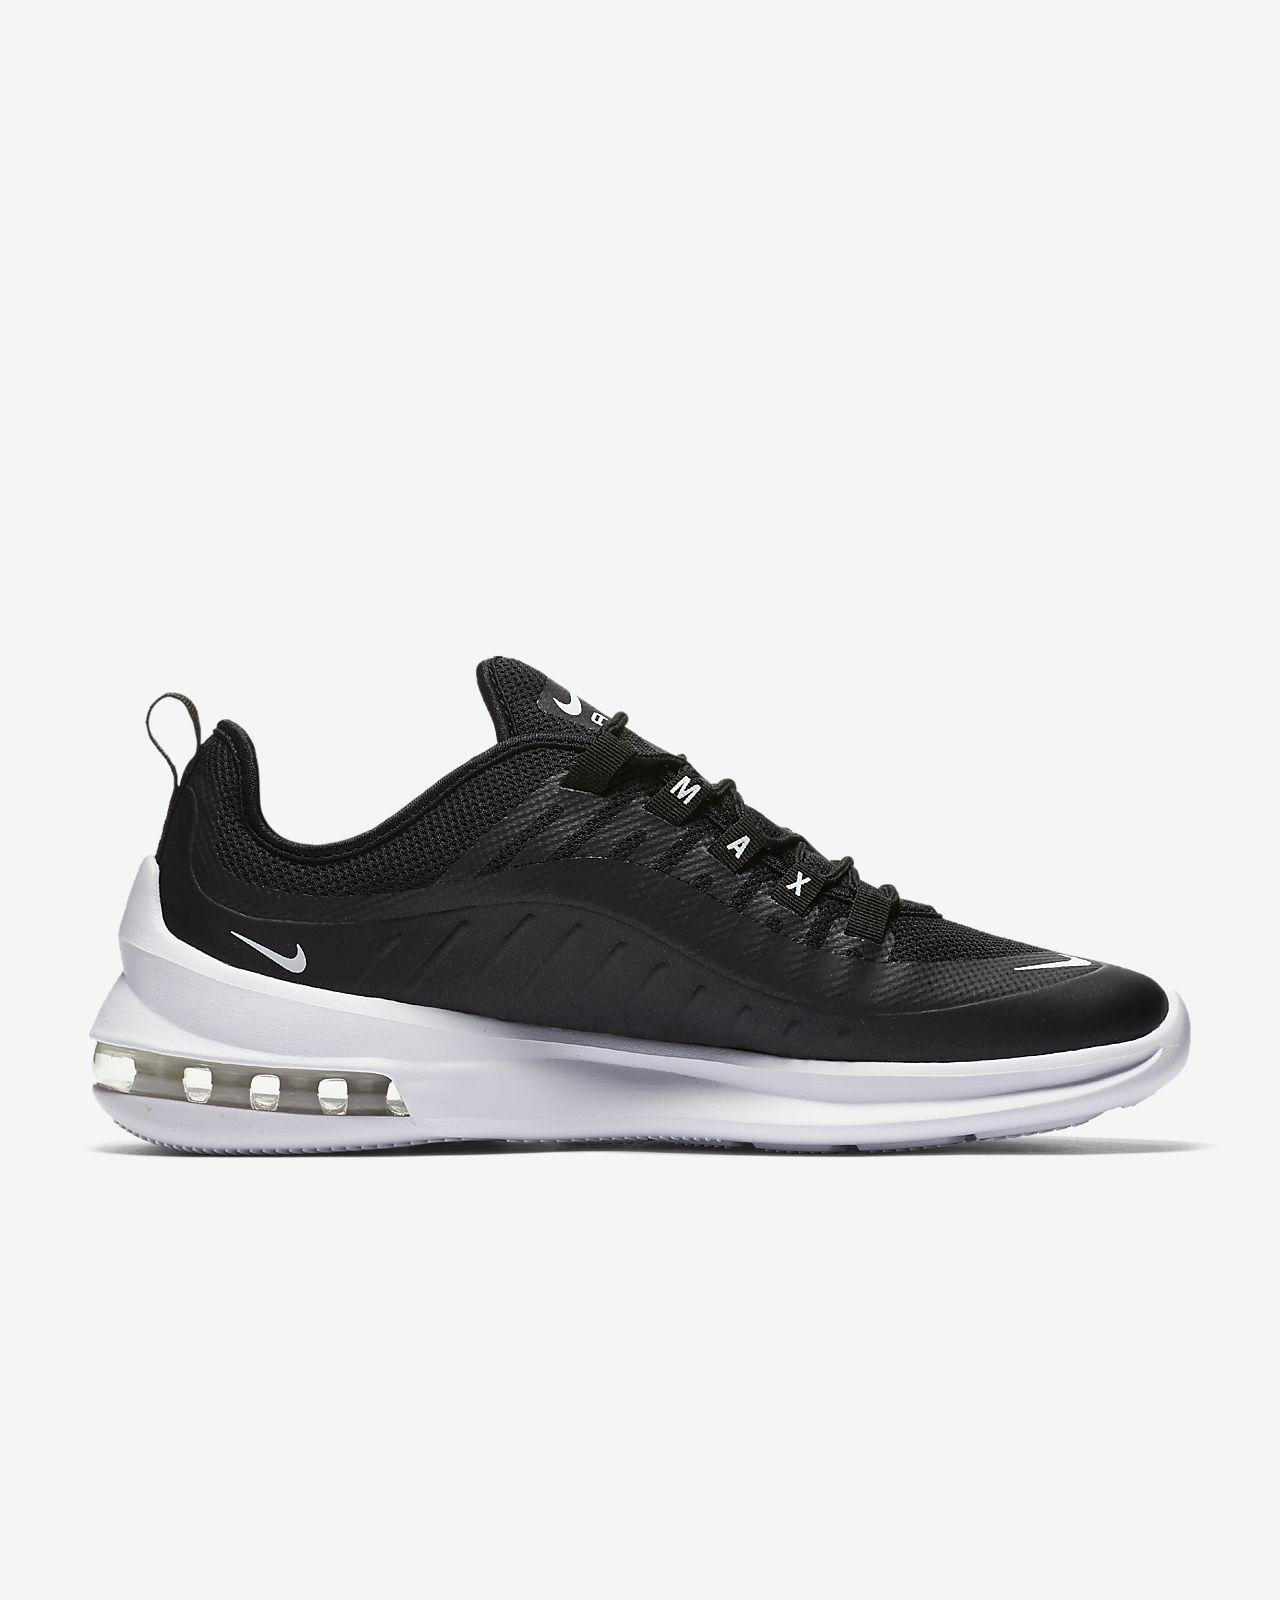 NIKE Air Max Axis Sneakers Black